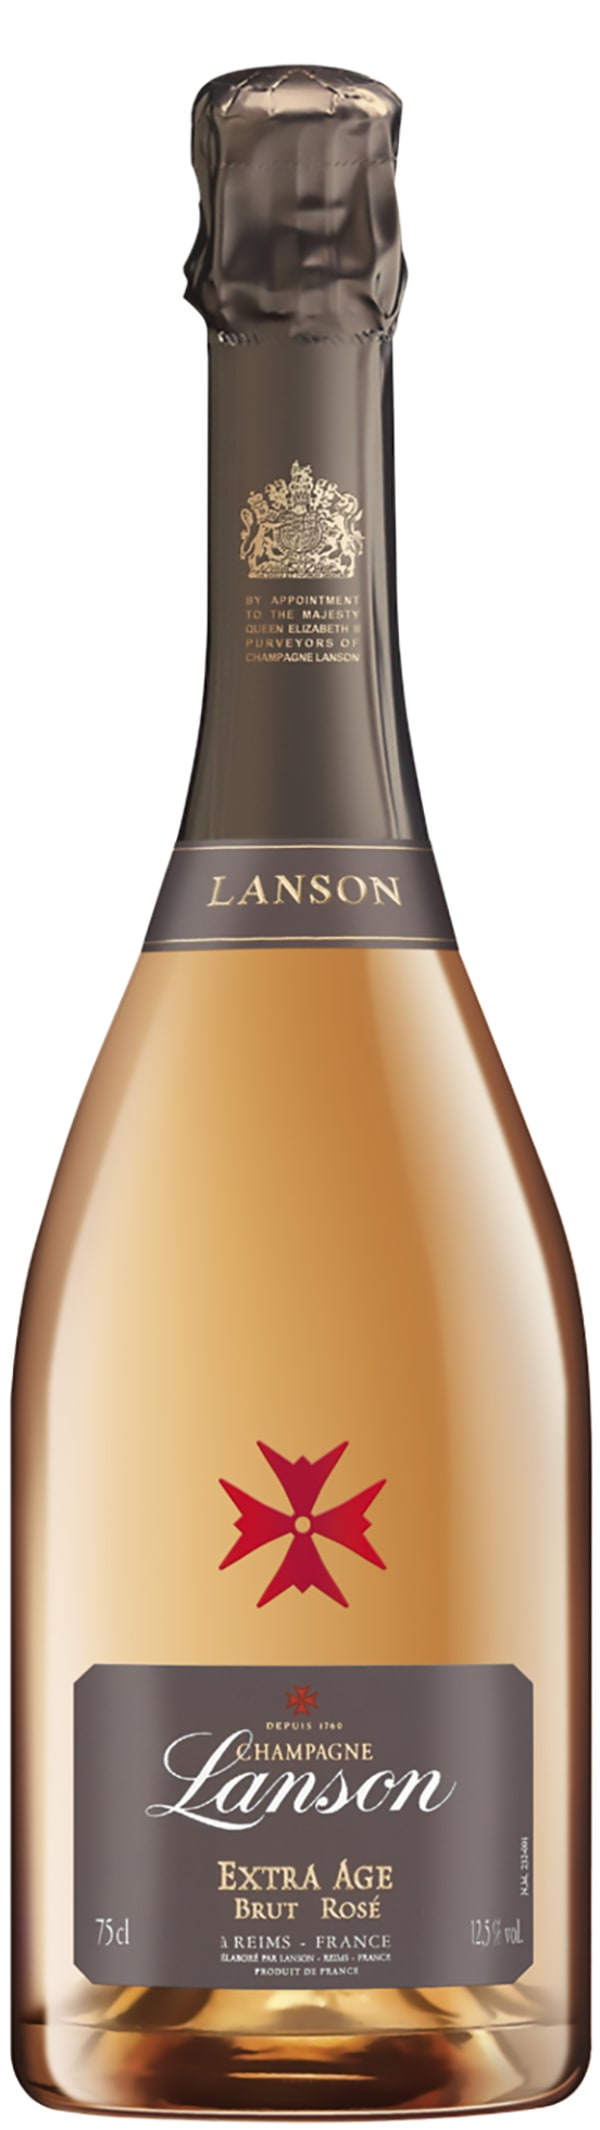 Lanson Extra Age Rosé Champagne Brut